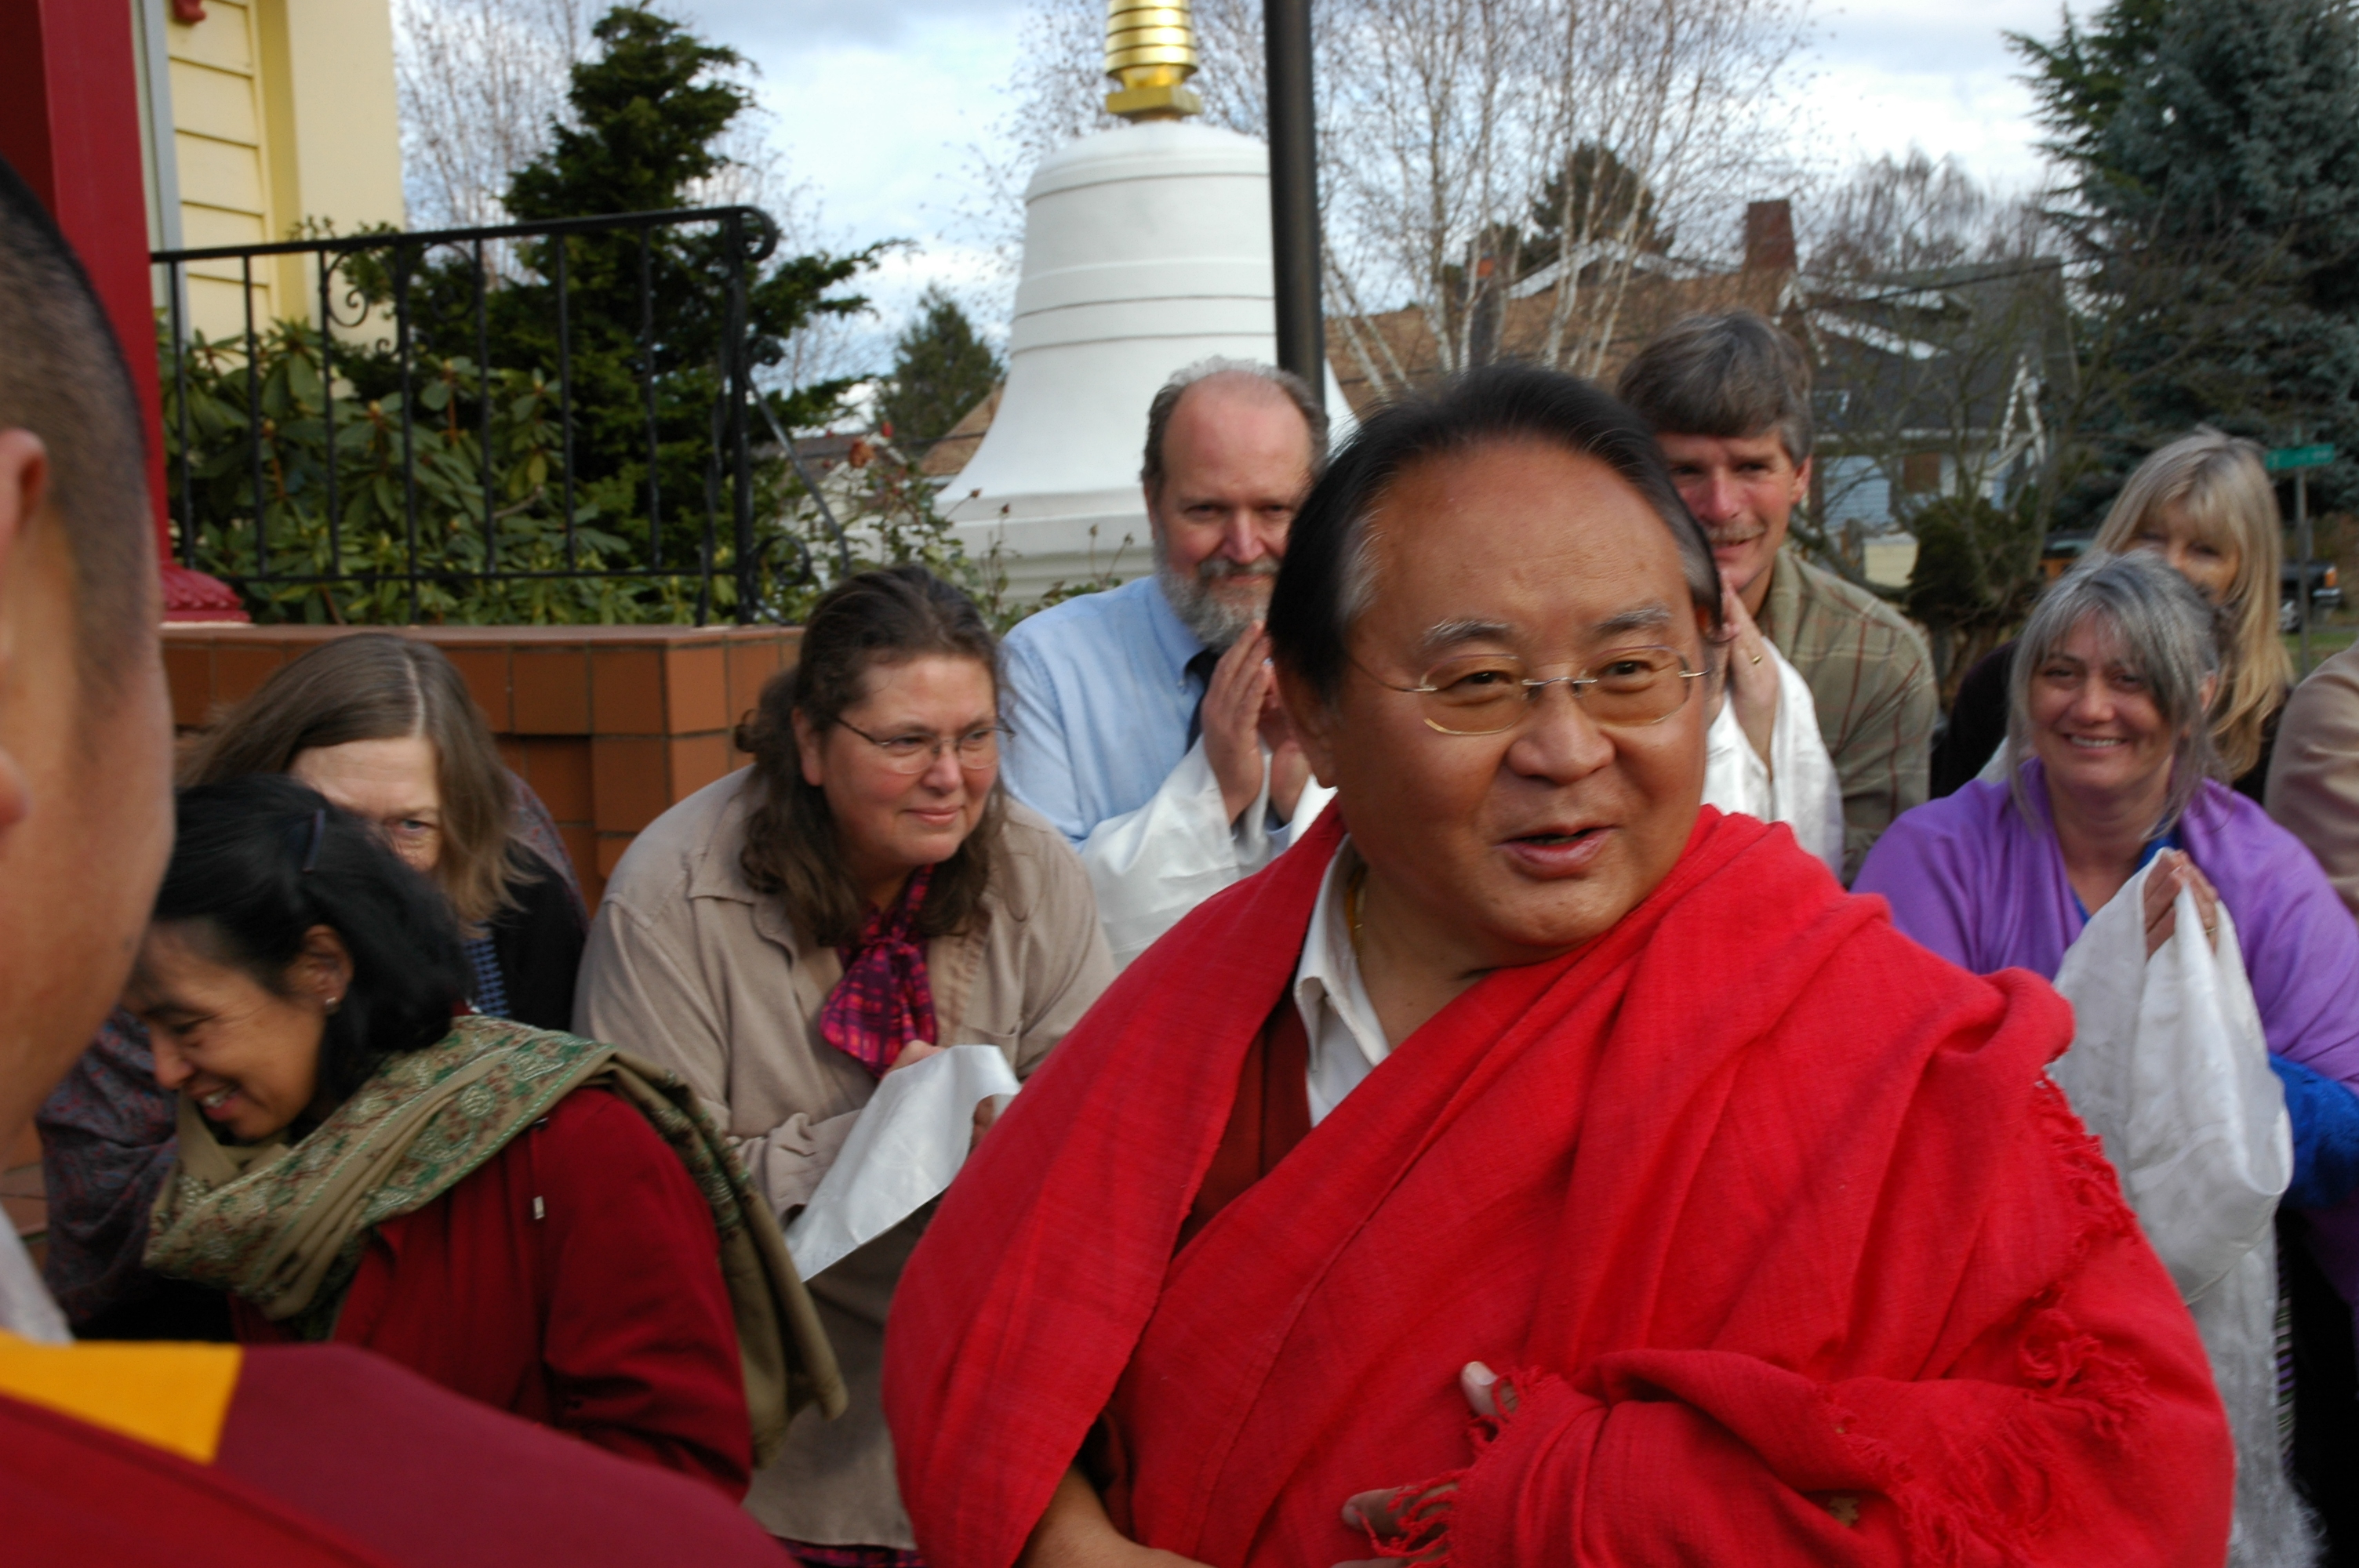 HE Sogyal Rinpoche arrives to speak about Buddhism, Seattle, Washington, USA